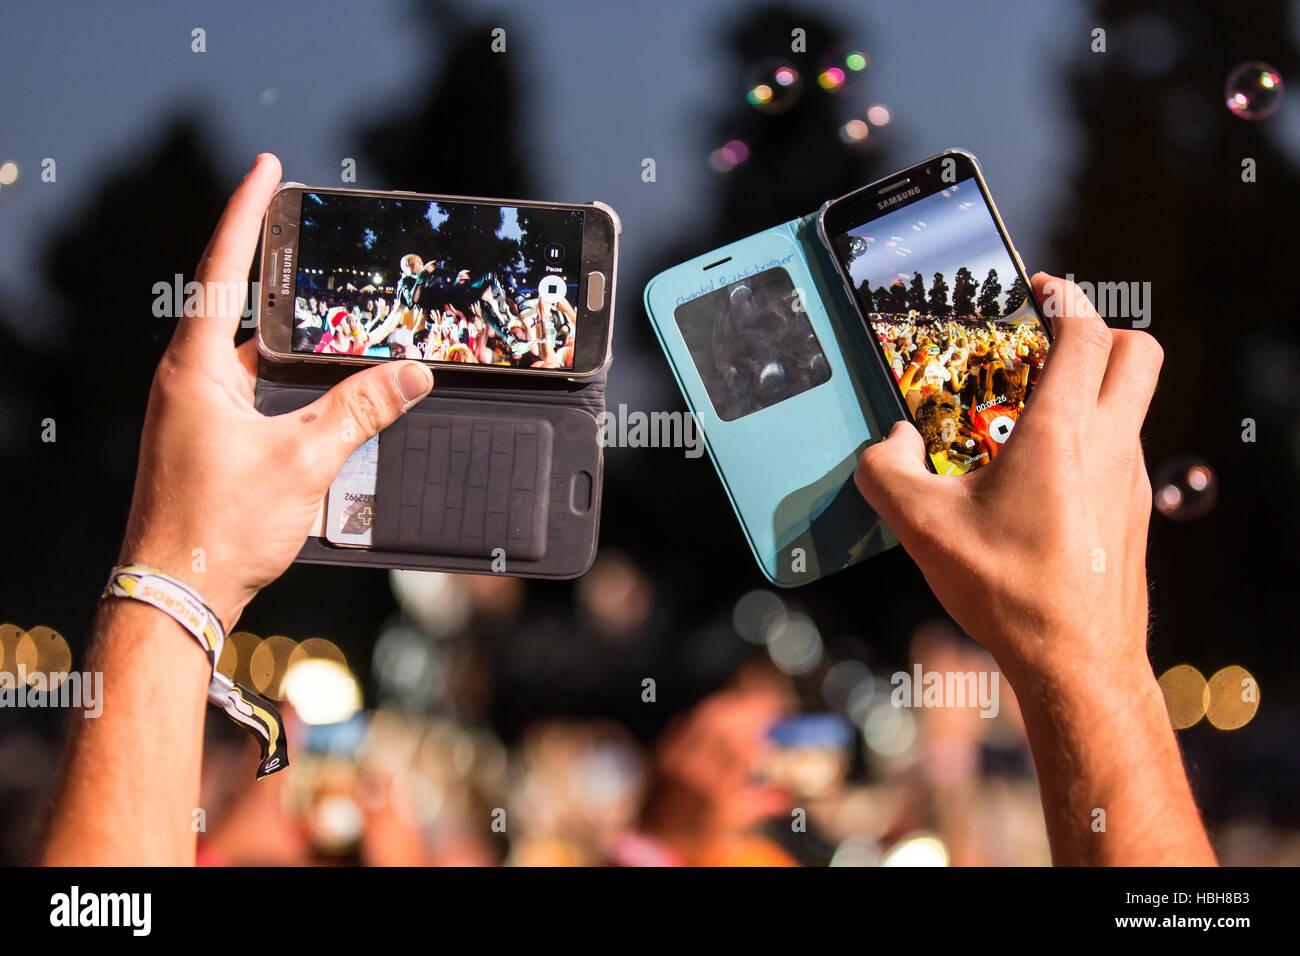 Skunk Anansie - Ventilador macht Foto mit Iphone Foto de stock